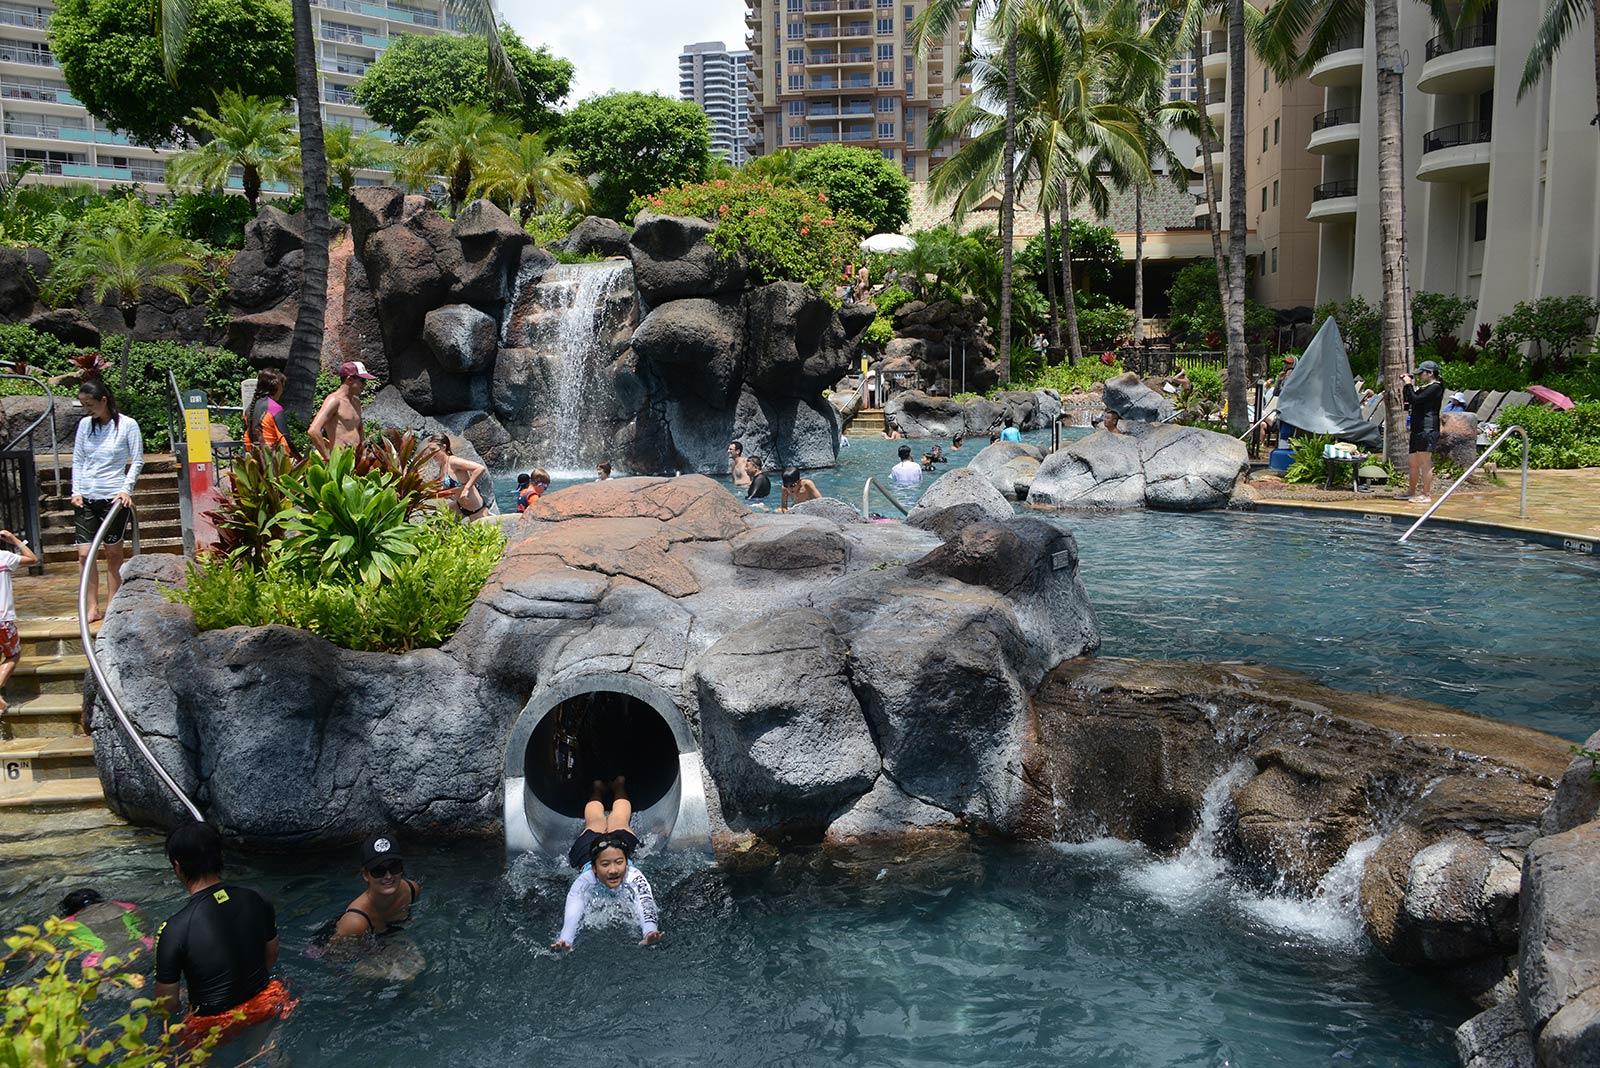 hilton-grand-vacation-suites-at-hilton-hawaiian-village-kalia-tower-4